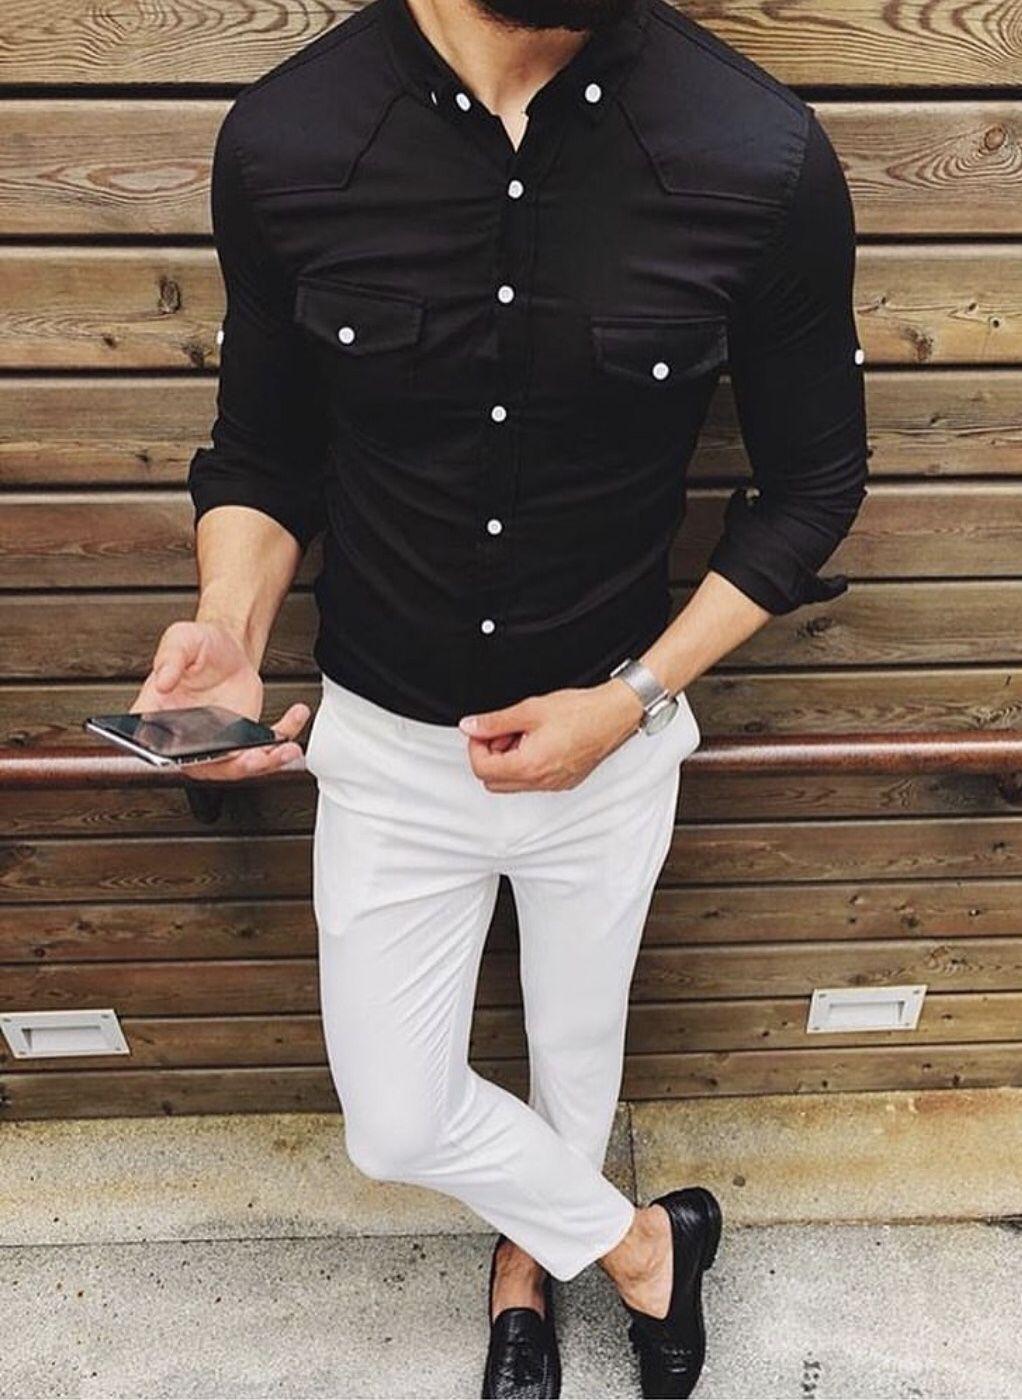 Giorgenti New York Custom Suits Custom Shirts Tuxedo Mens Dress Shirts Outfit Mens Shirt Dress Menswear [ 1400 x 1022 Pixel ]